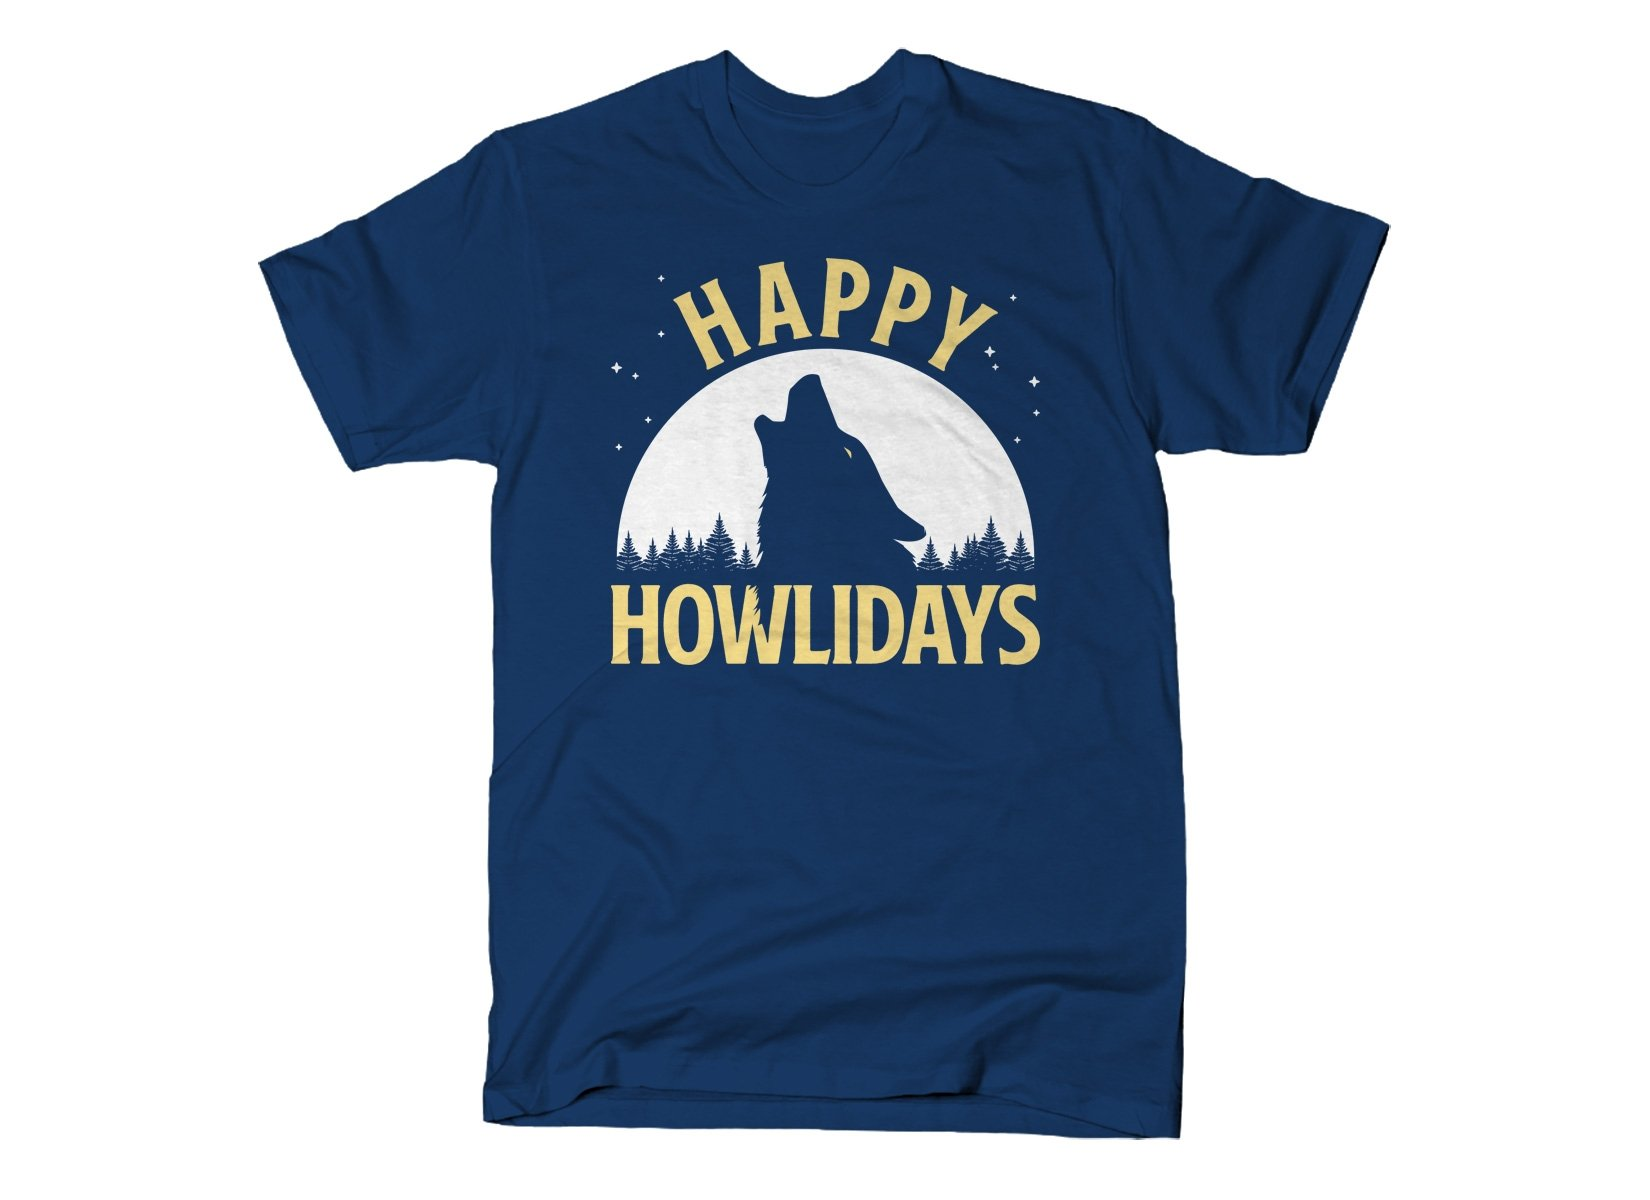 Happy Howlidays on Mens T-Shirt